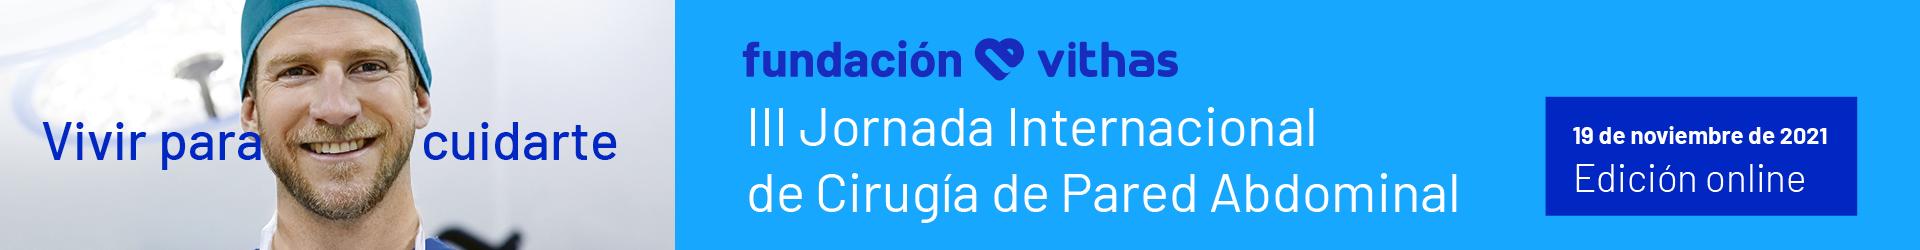 Vithas_III_Jornada_Int_Cirugia_Abdominal_1920x250